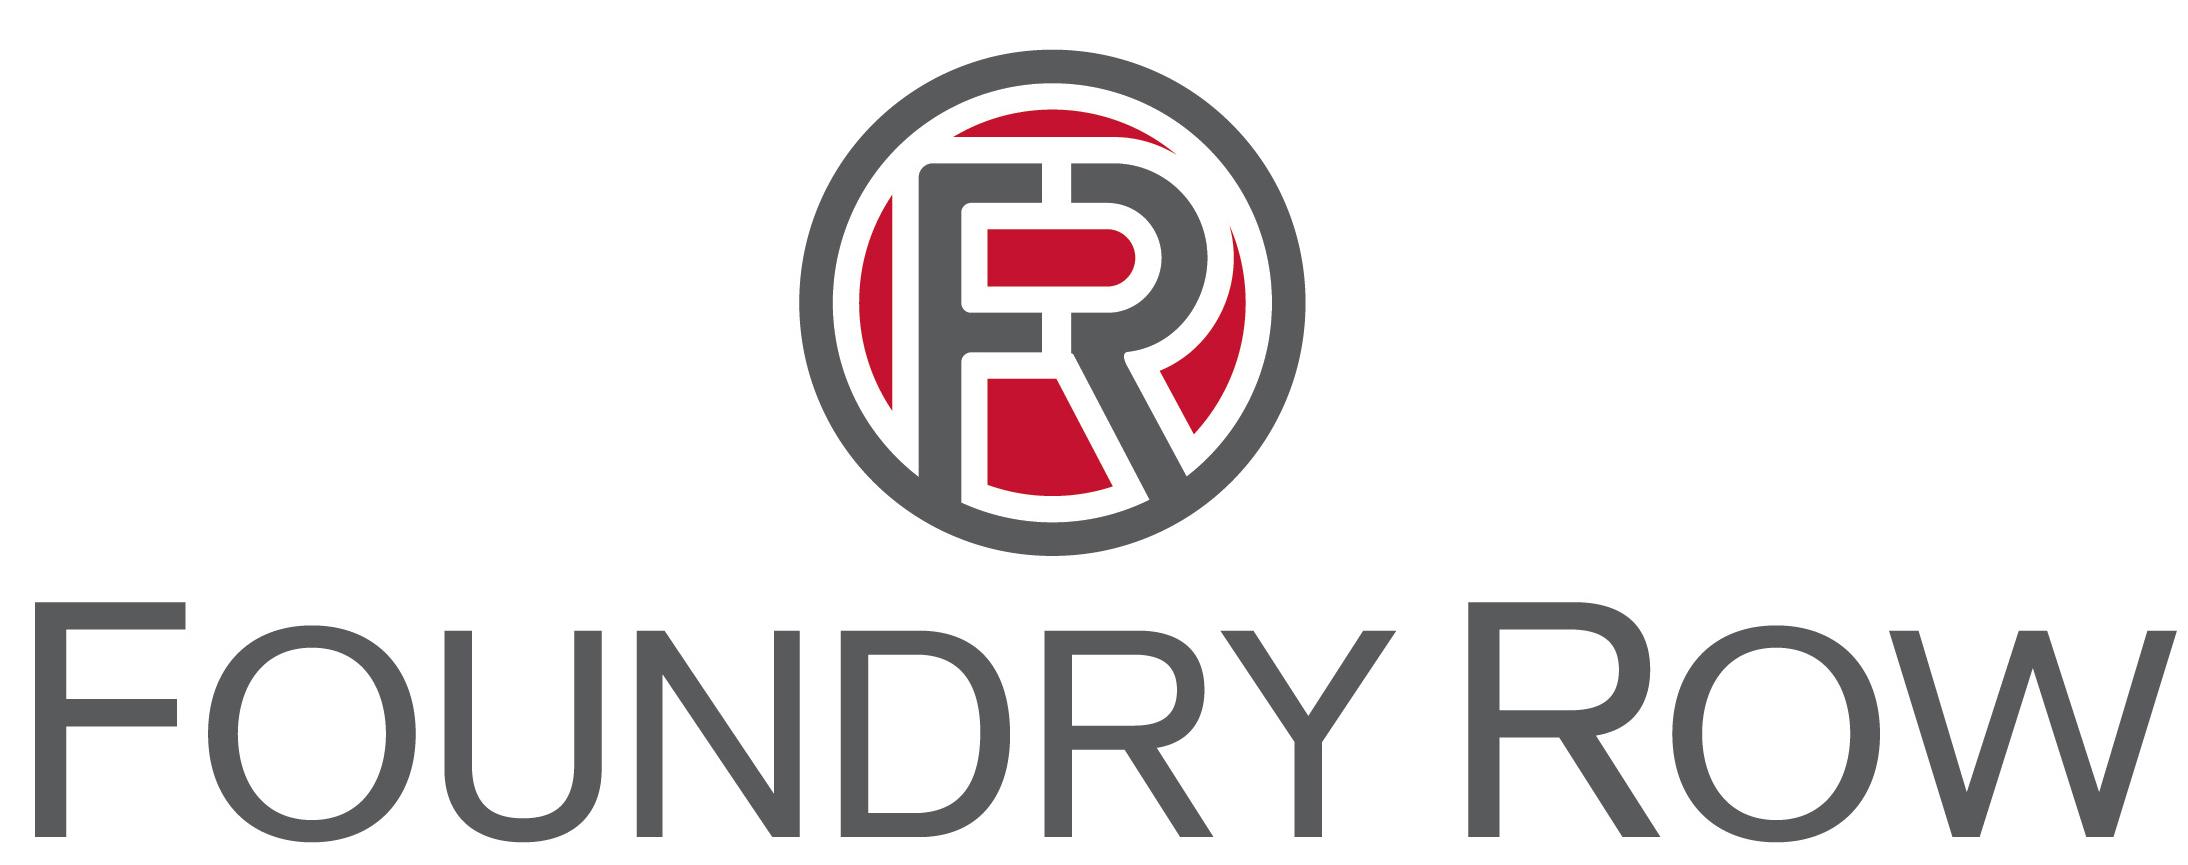 https://growthzonesitesprod.azureedge.net/wp-content/uploads/sites/803/2020/10/Foundry_Row_Logo.jpg